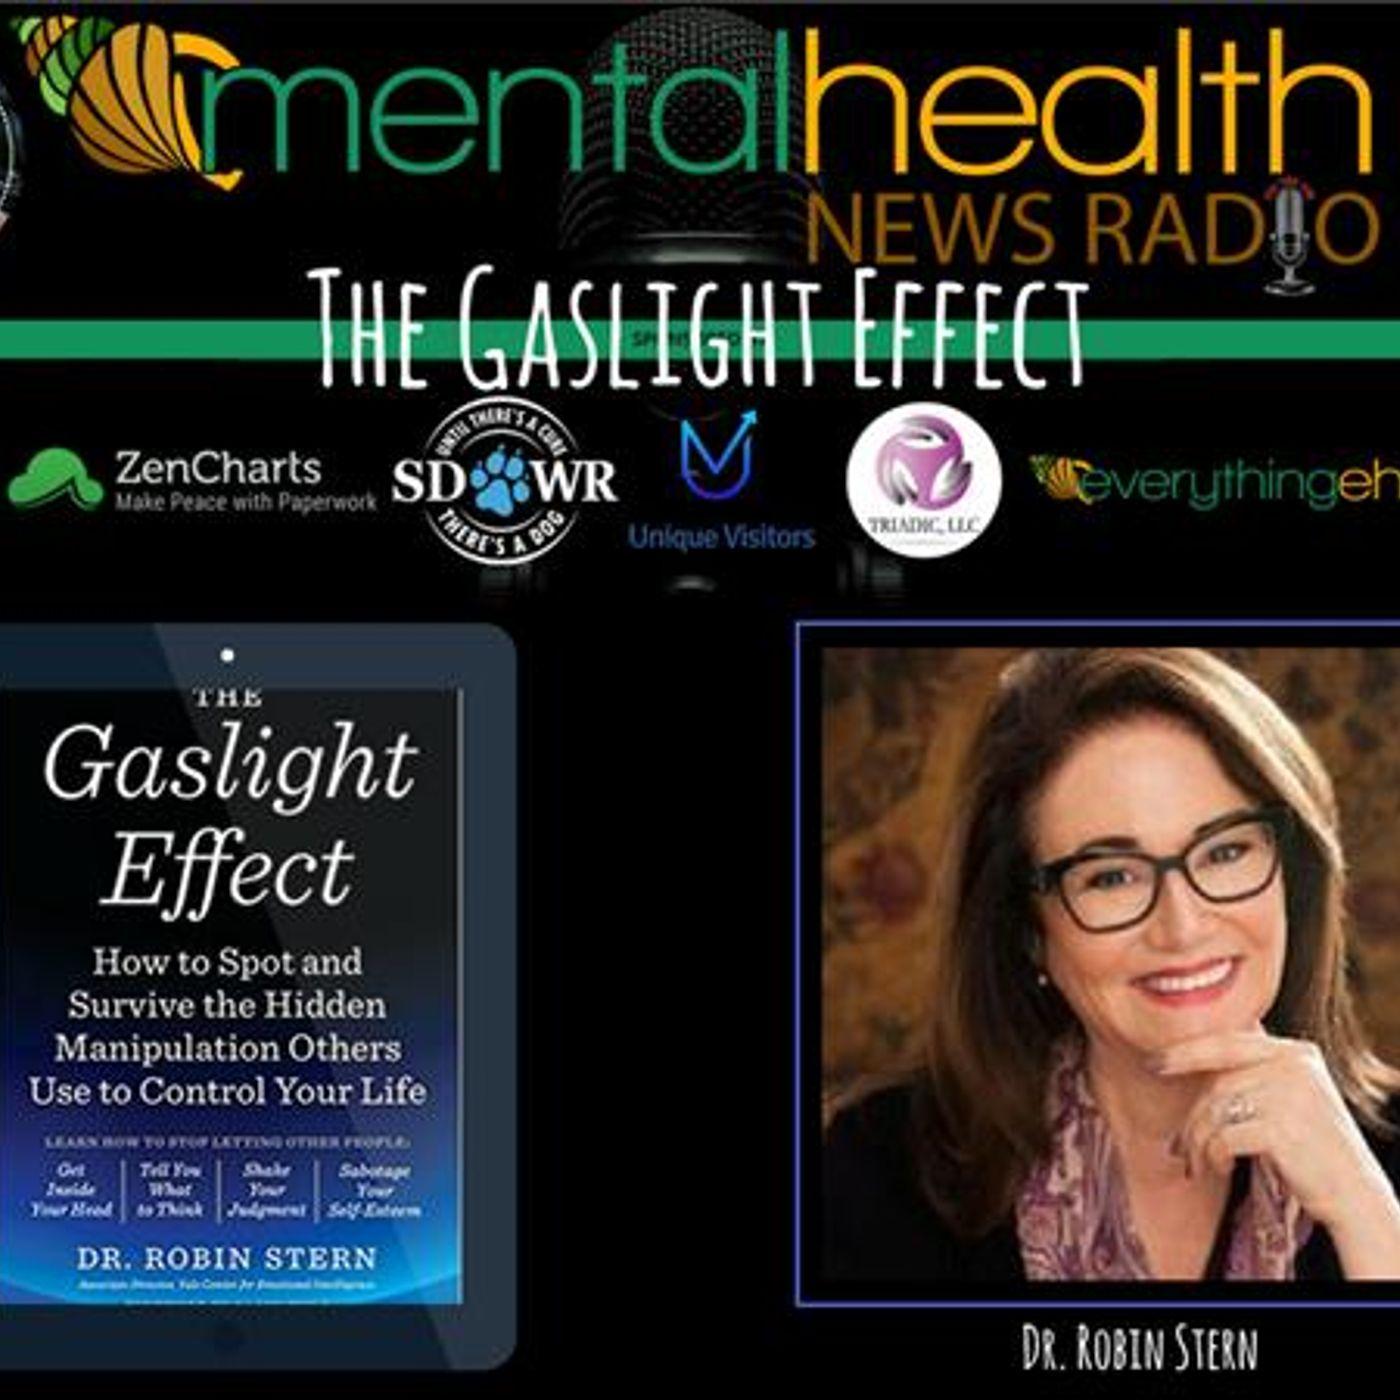 Mental Health News Radio - The Gaslight Effect with Dr. Robin Stern